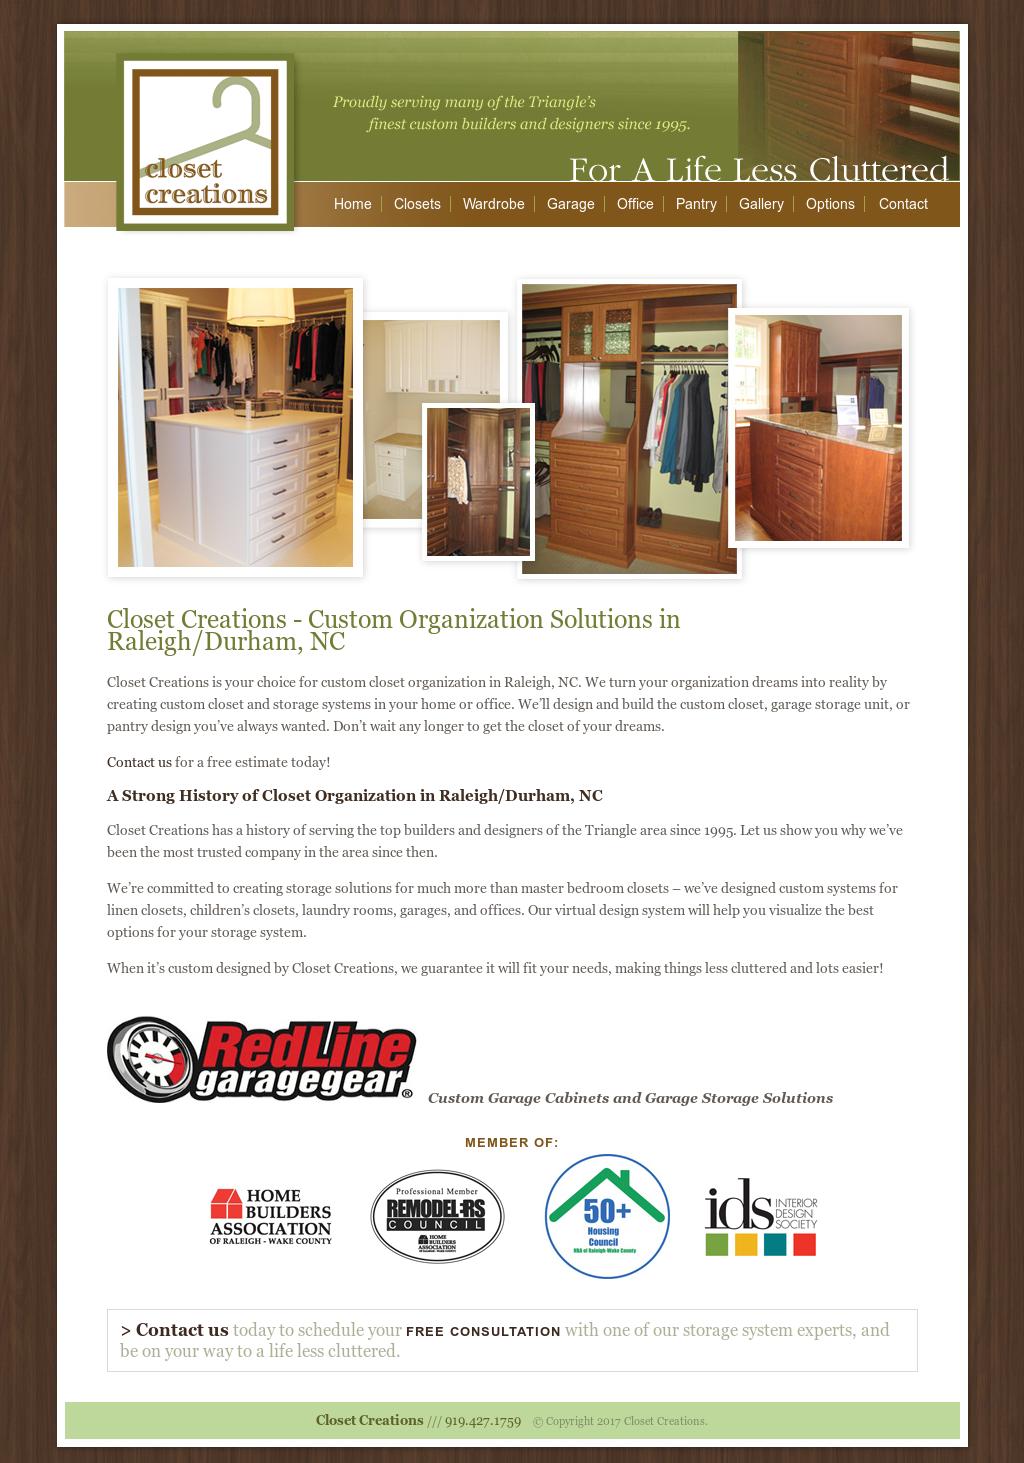 Closet Creations Website History